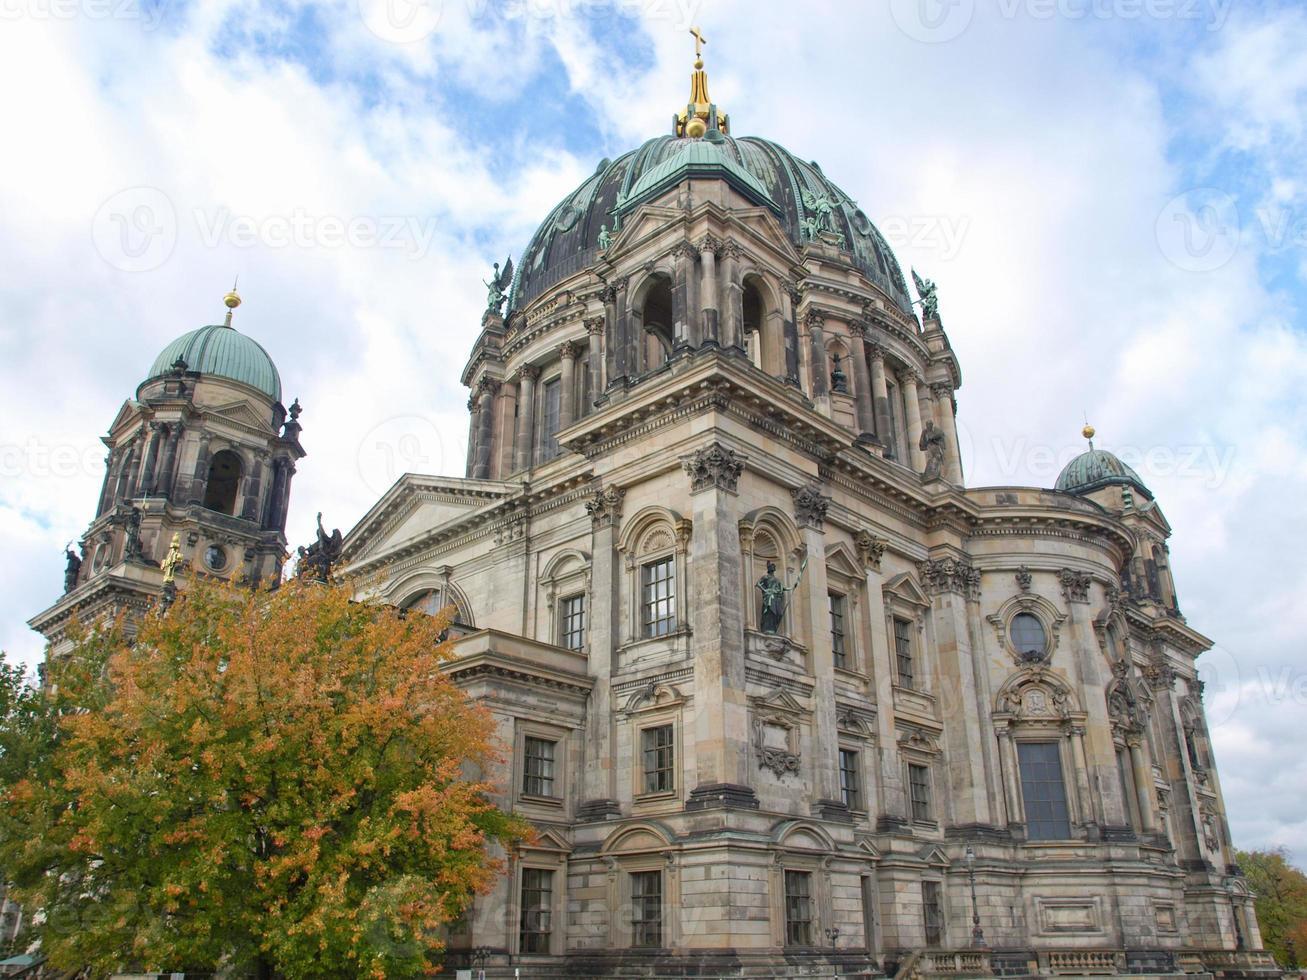 catedral dom berliner em berlim foto